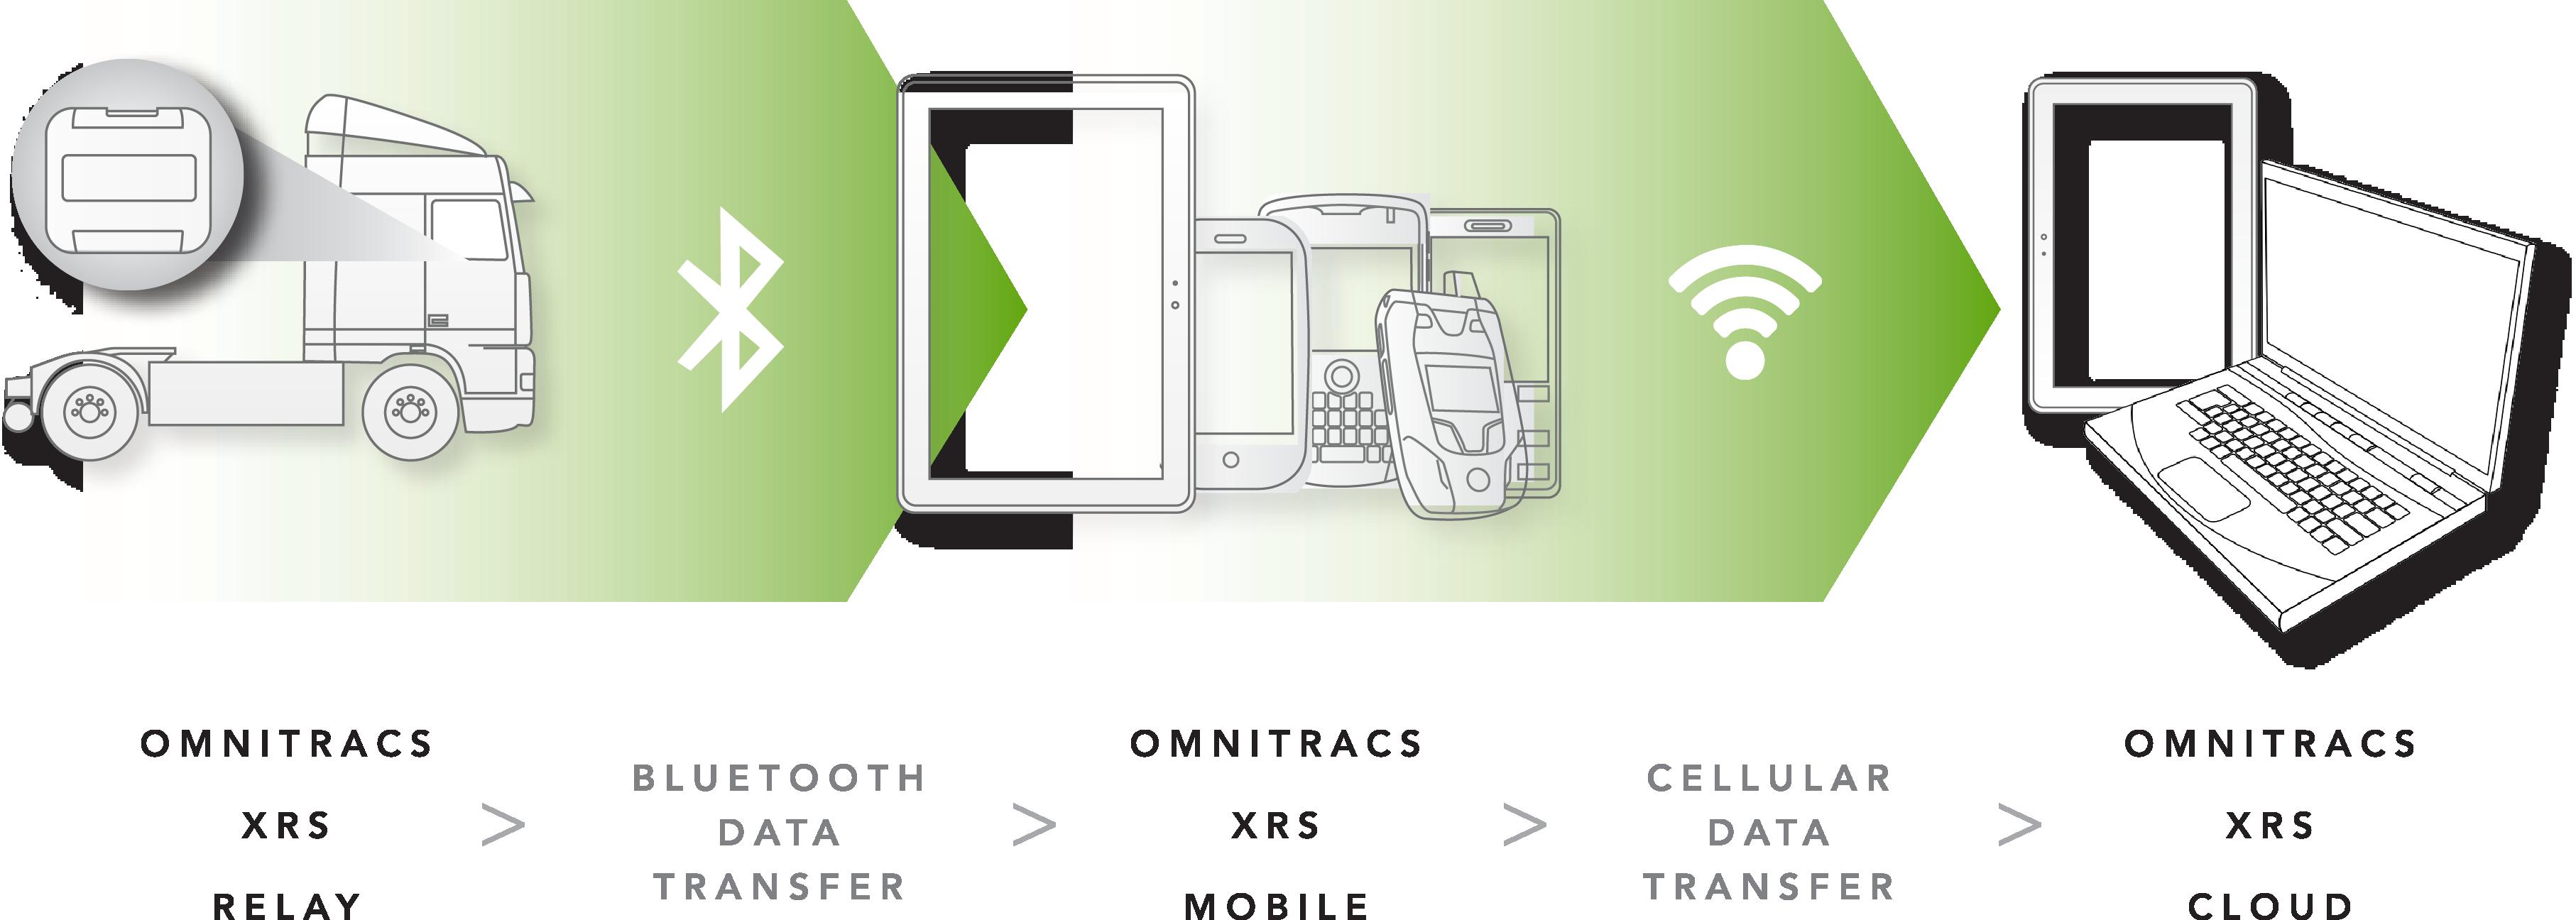 omnitracs xra relay graphic